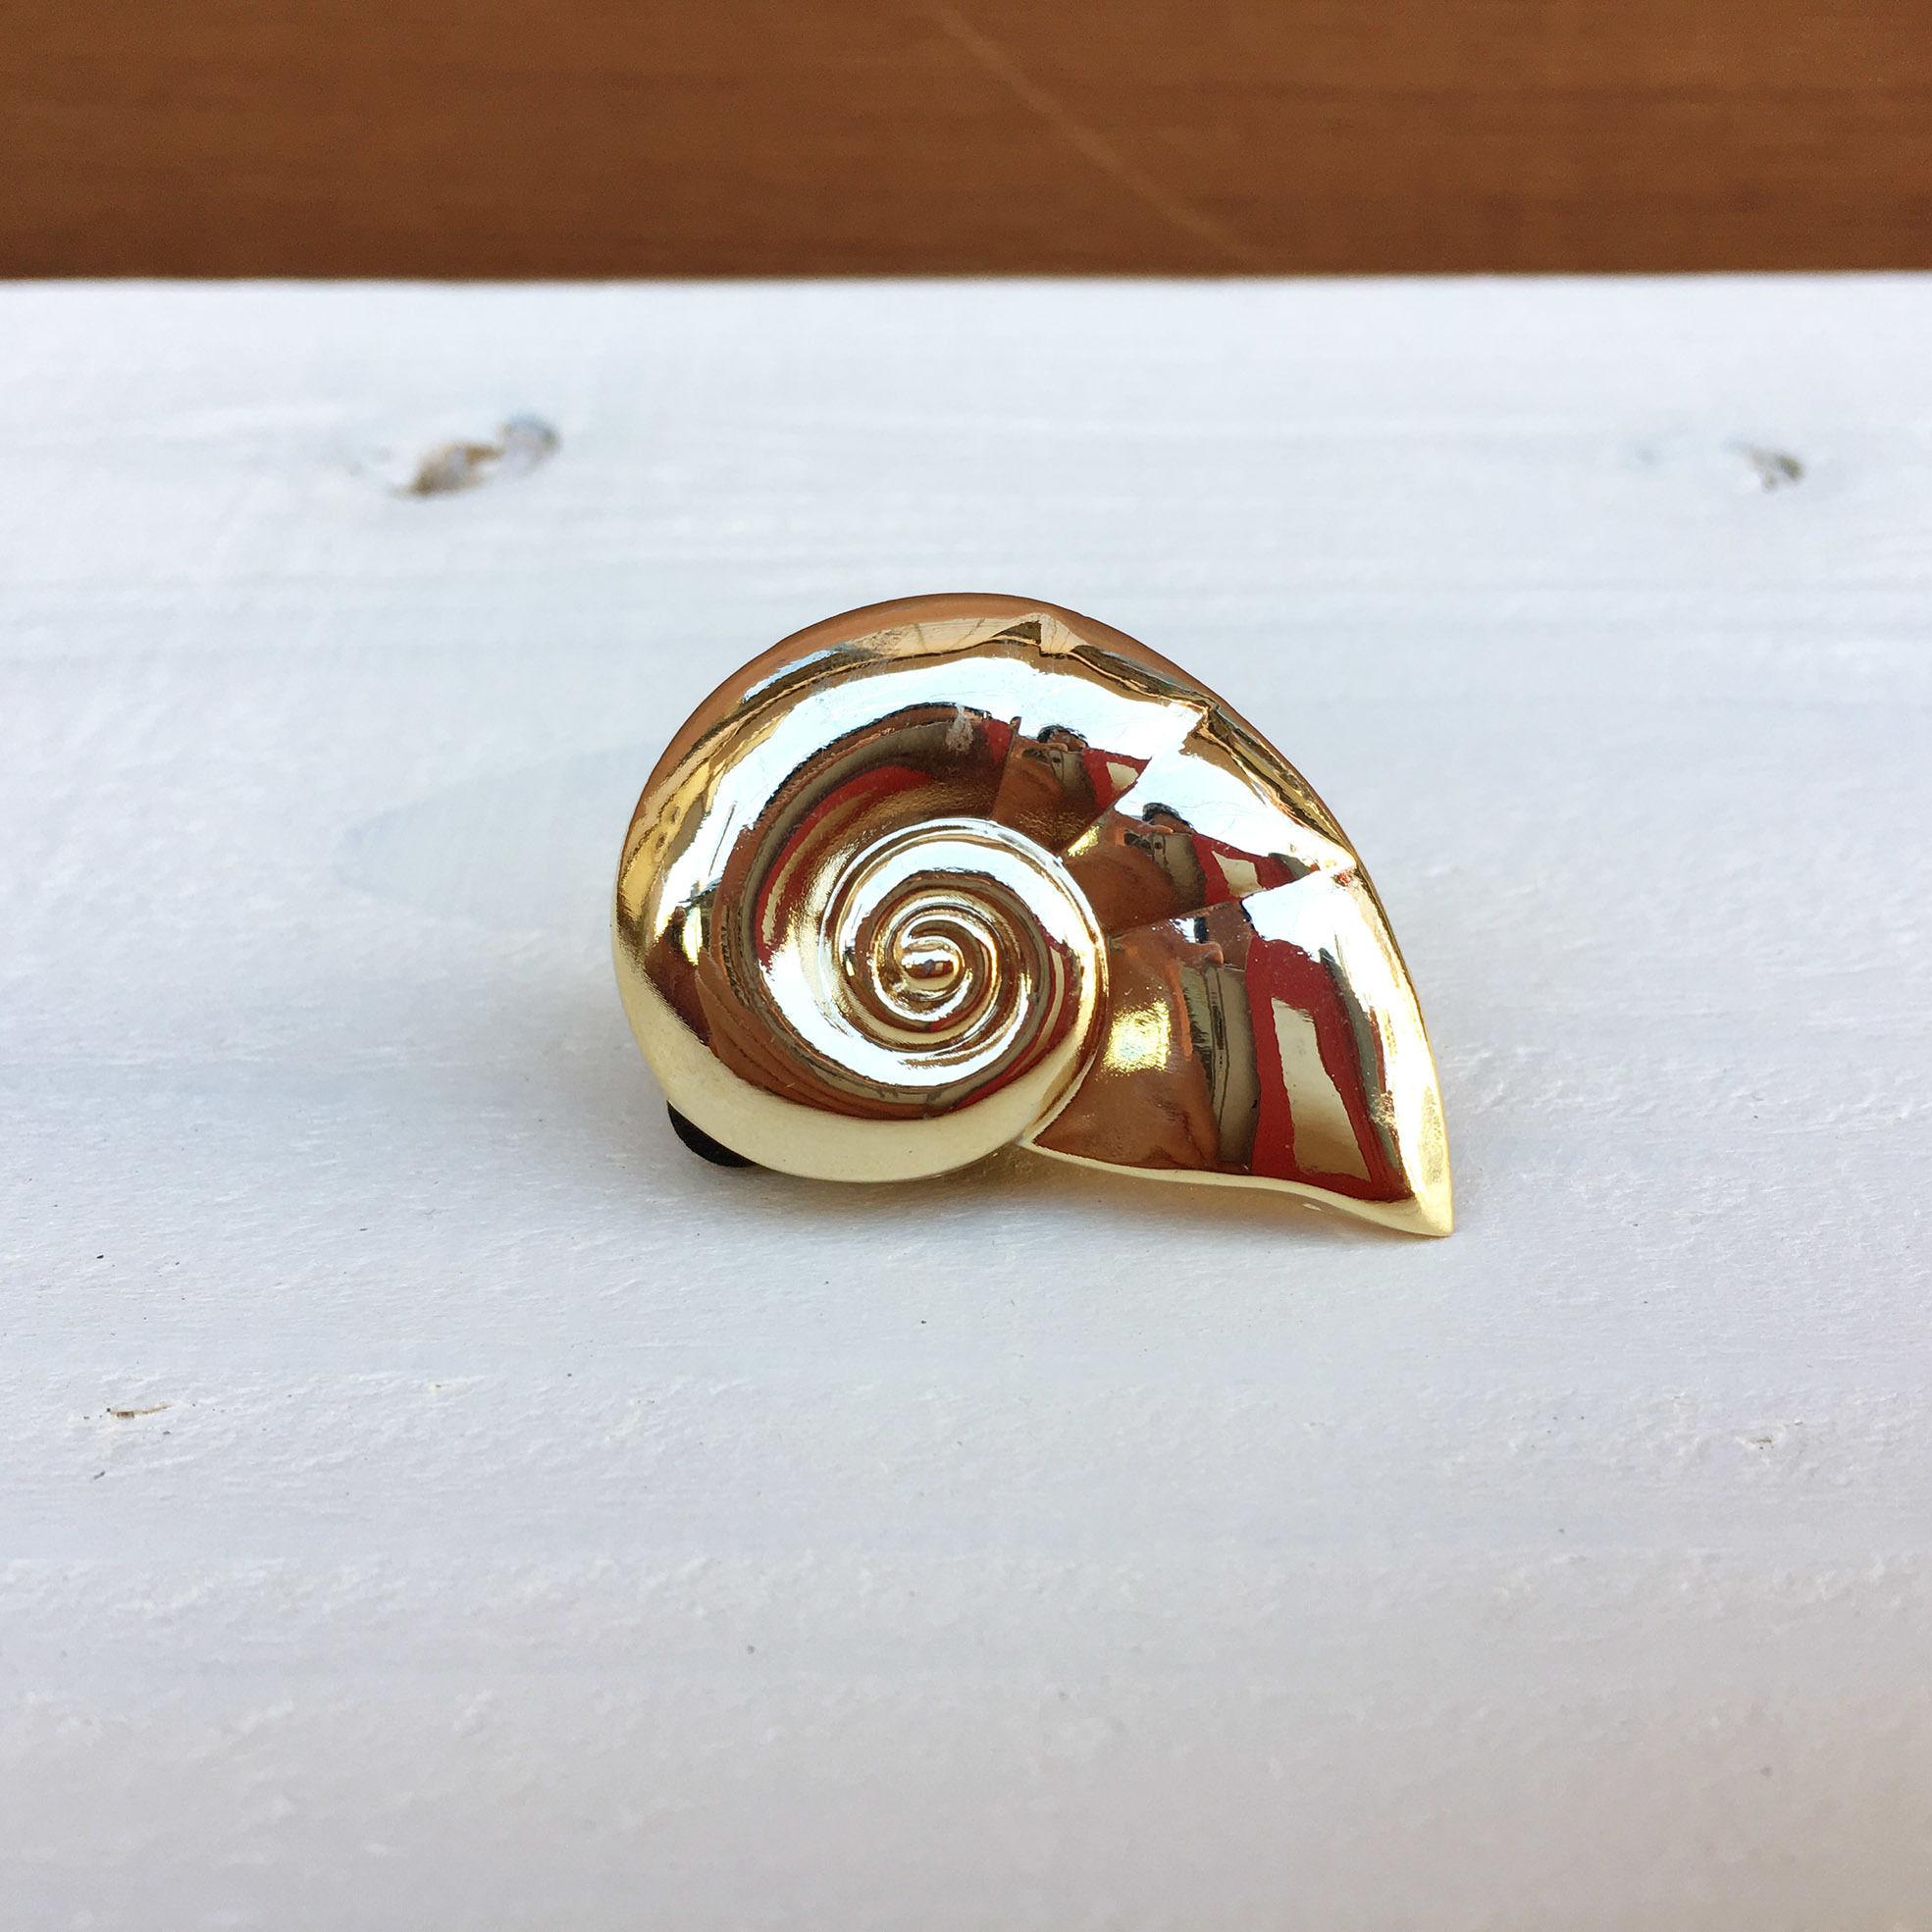 THE LITTLE MERMAID Little Mermaid Pin/リトルマーメイド ピンズ/180114-4